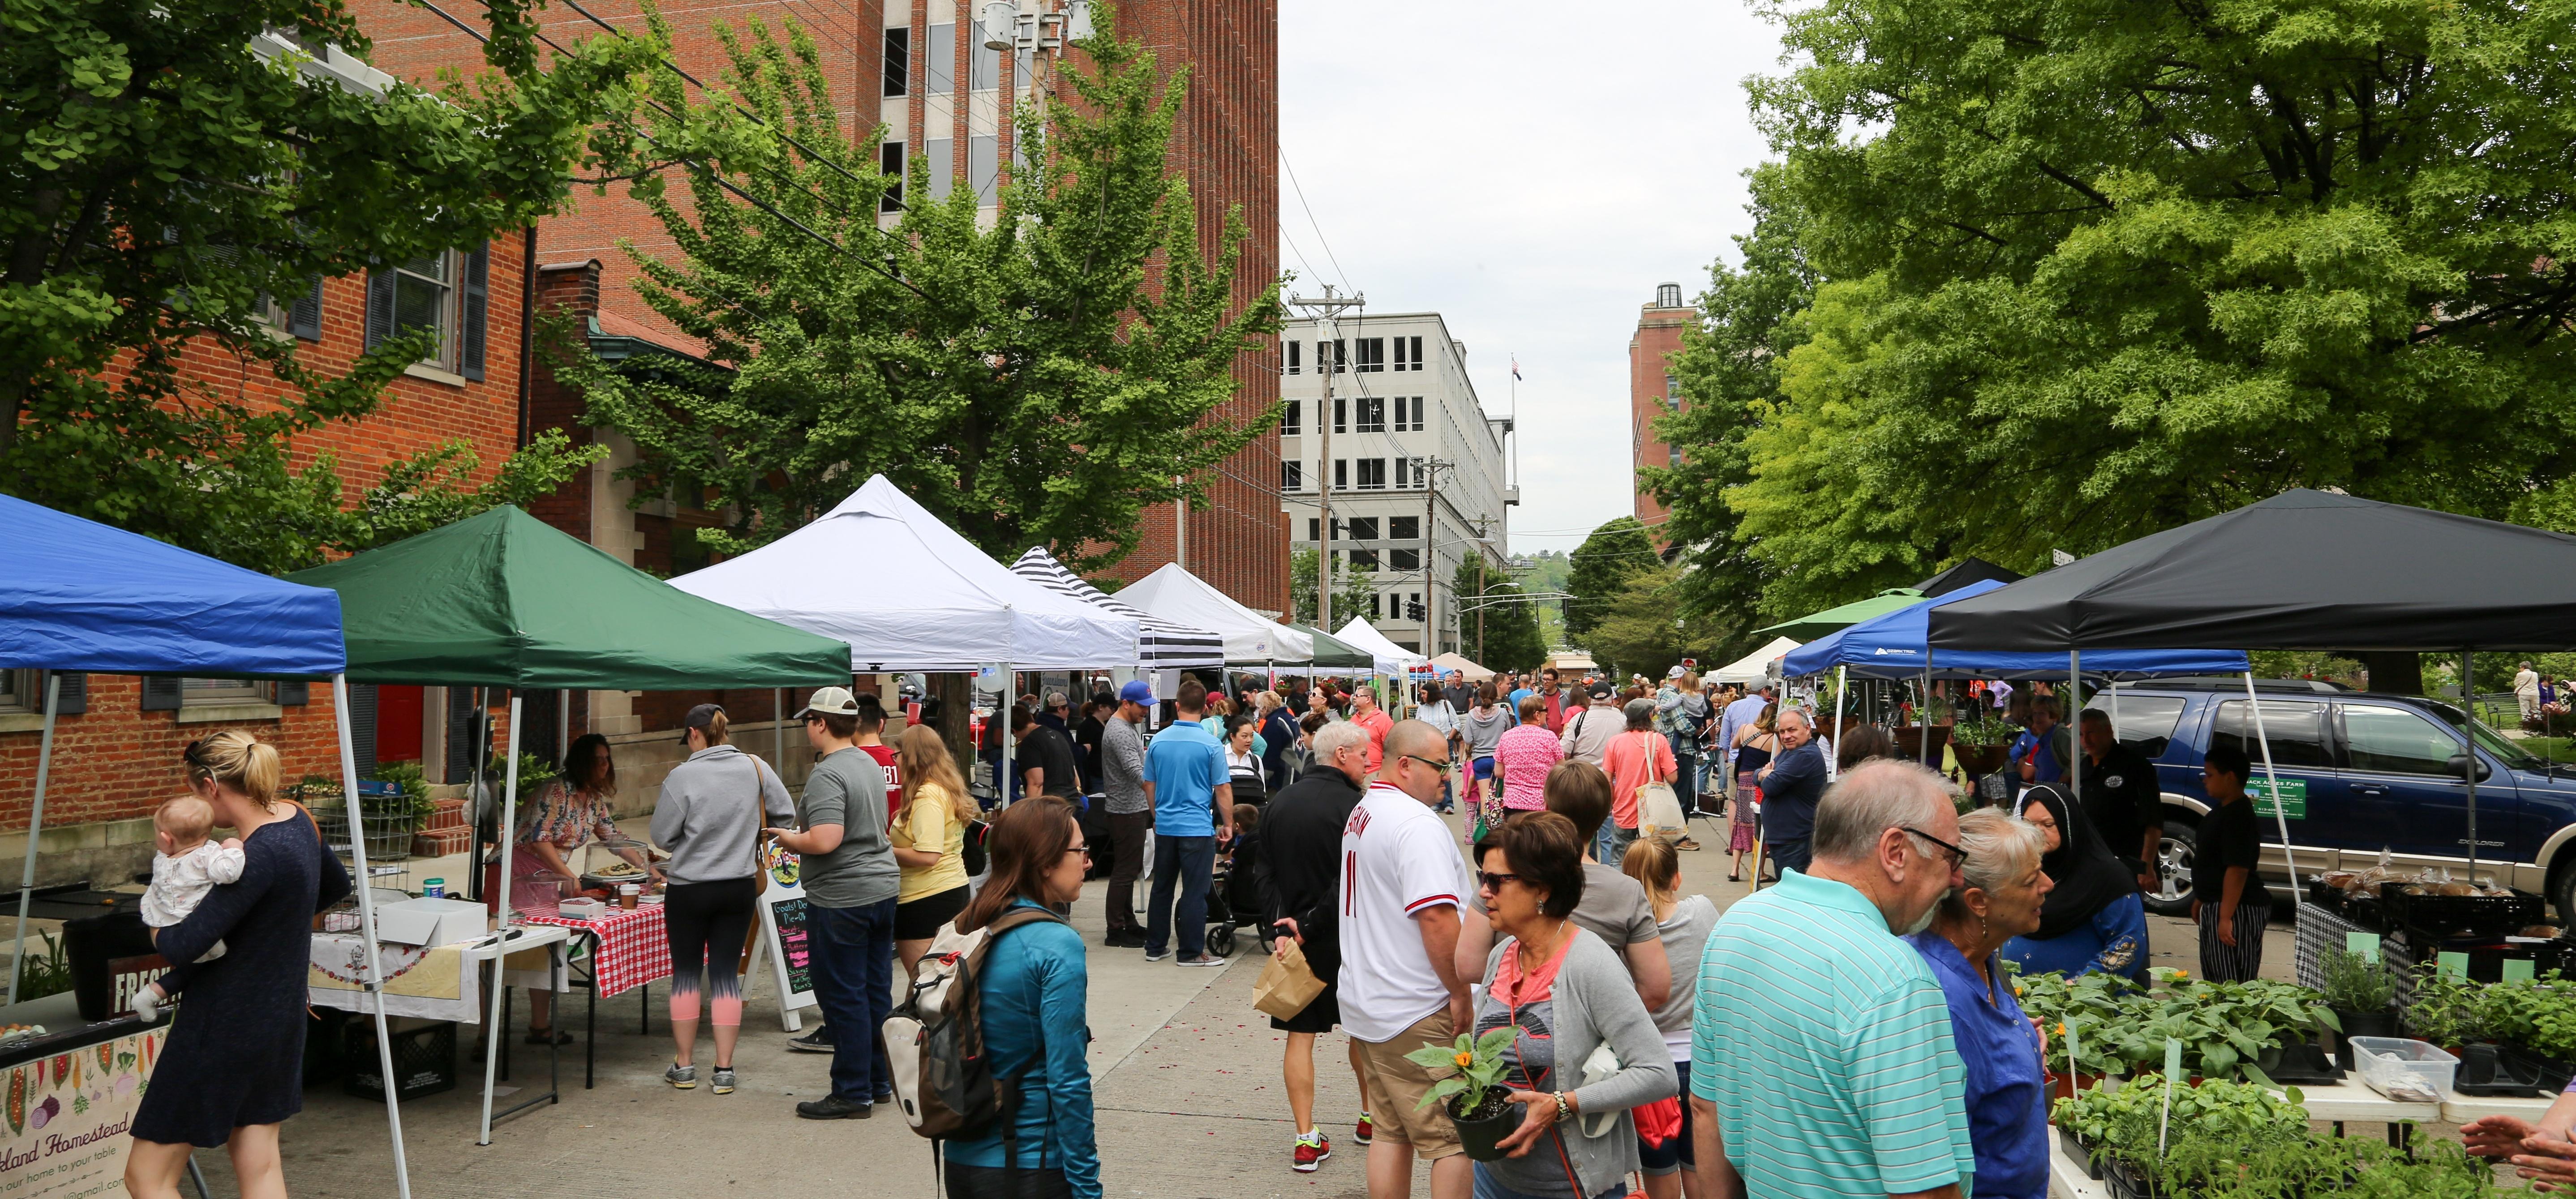 Covington Farmers Market-894710-edited.jpg